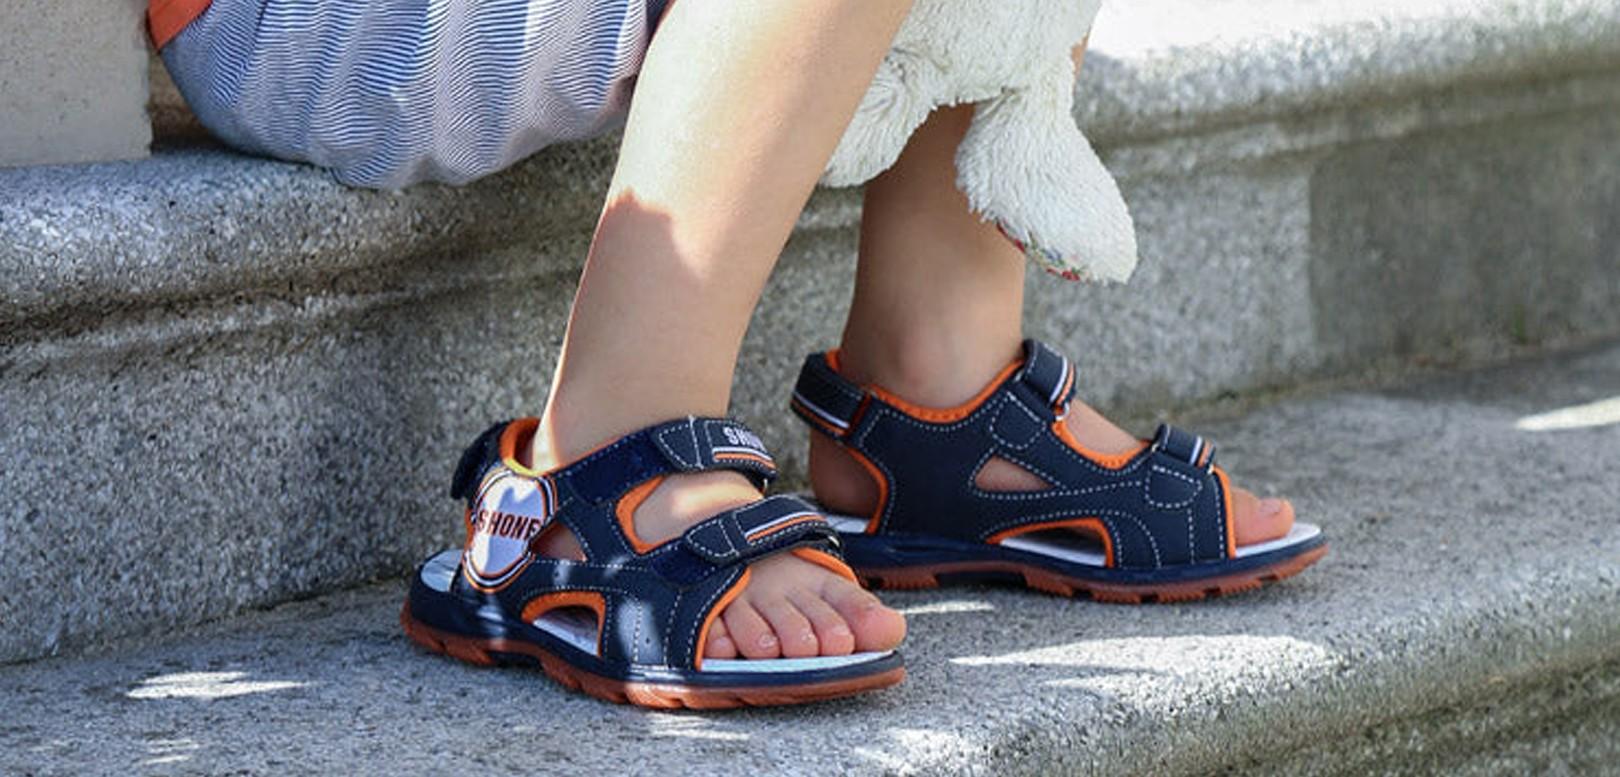 SHONE ✔️ Обувки за деца ᐉ ТОП Цени — Kidsfasion.bg